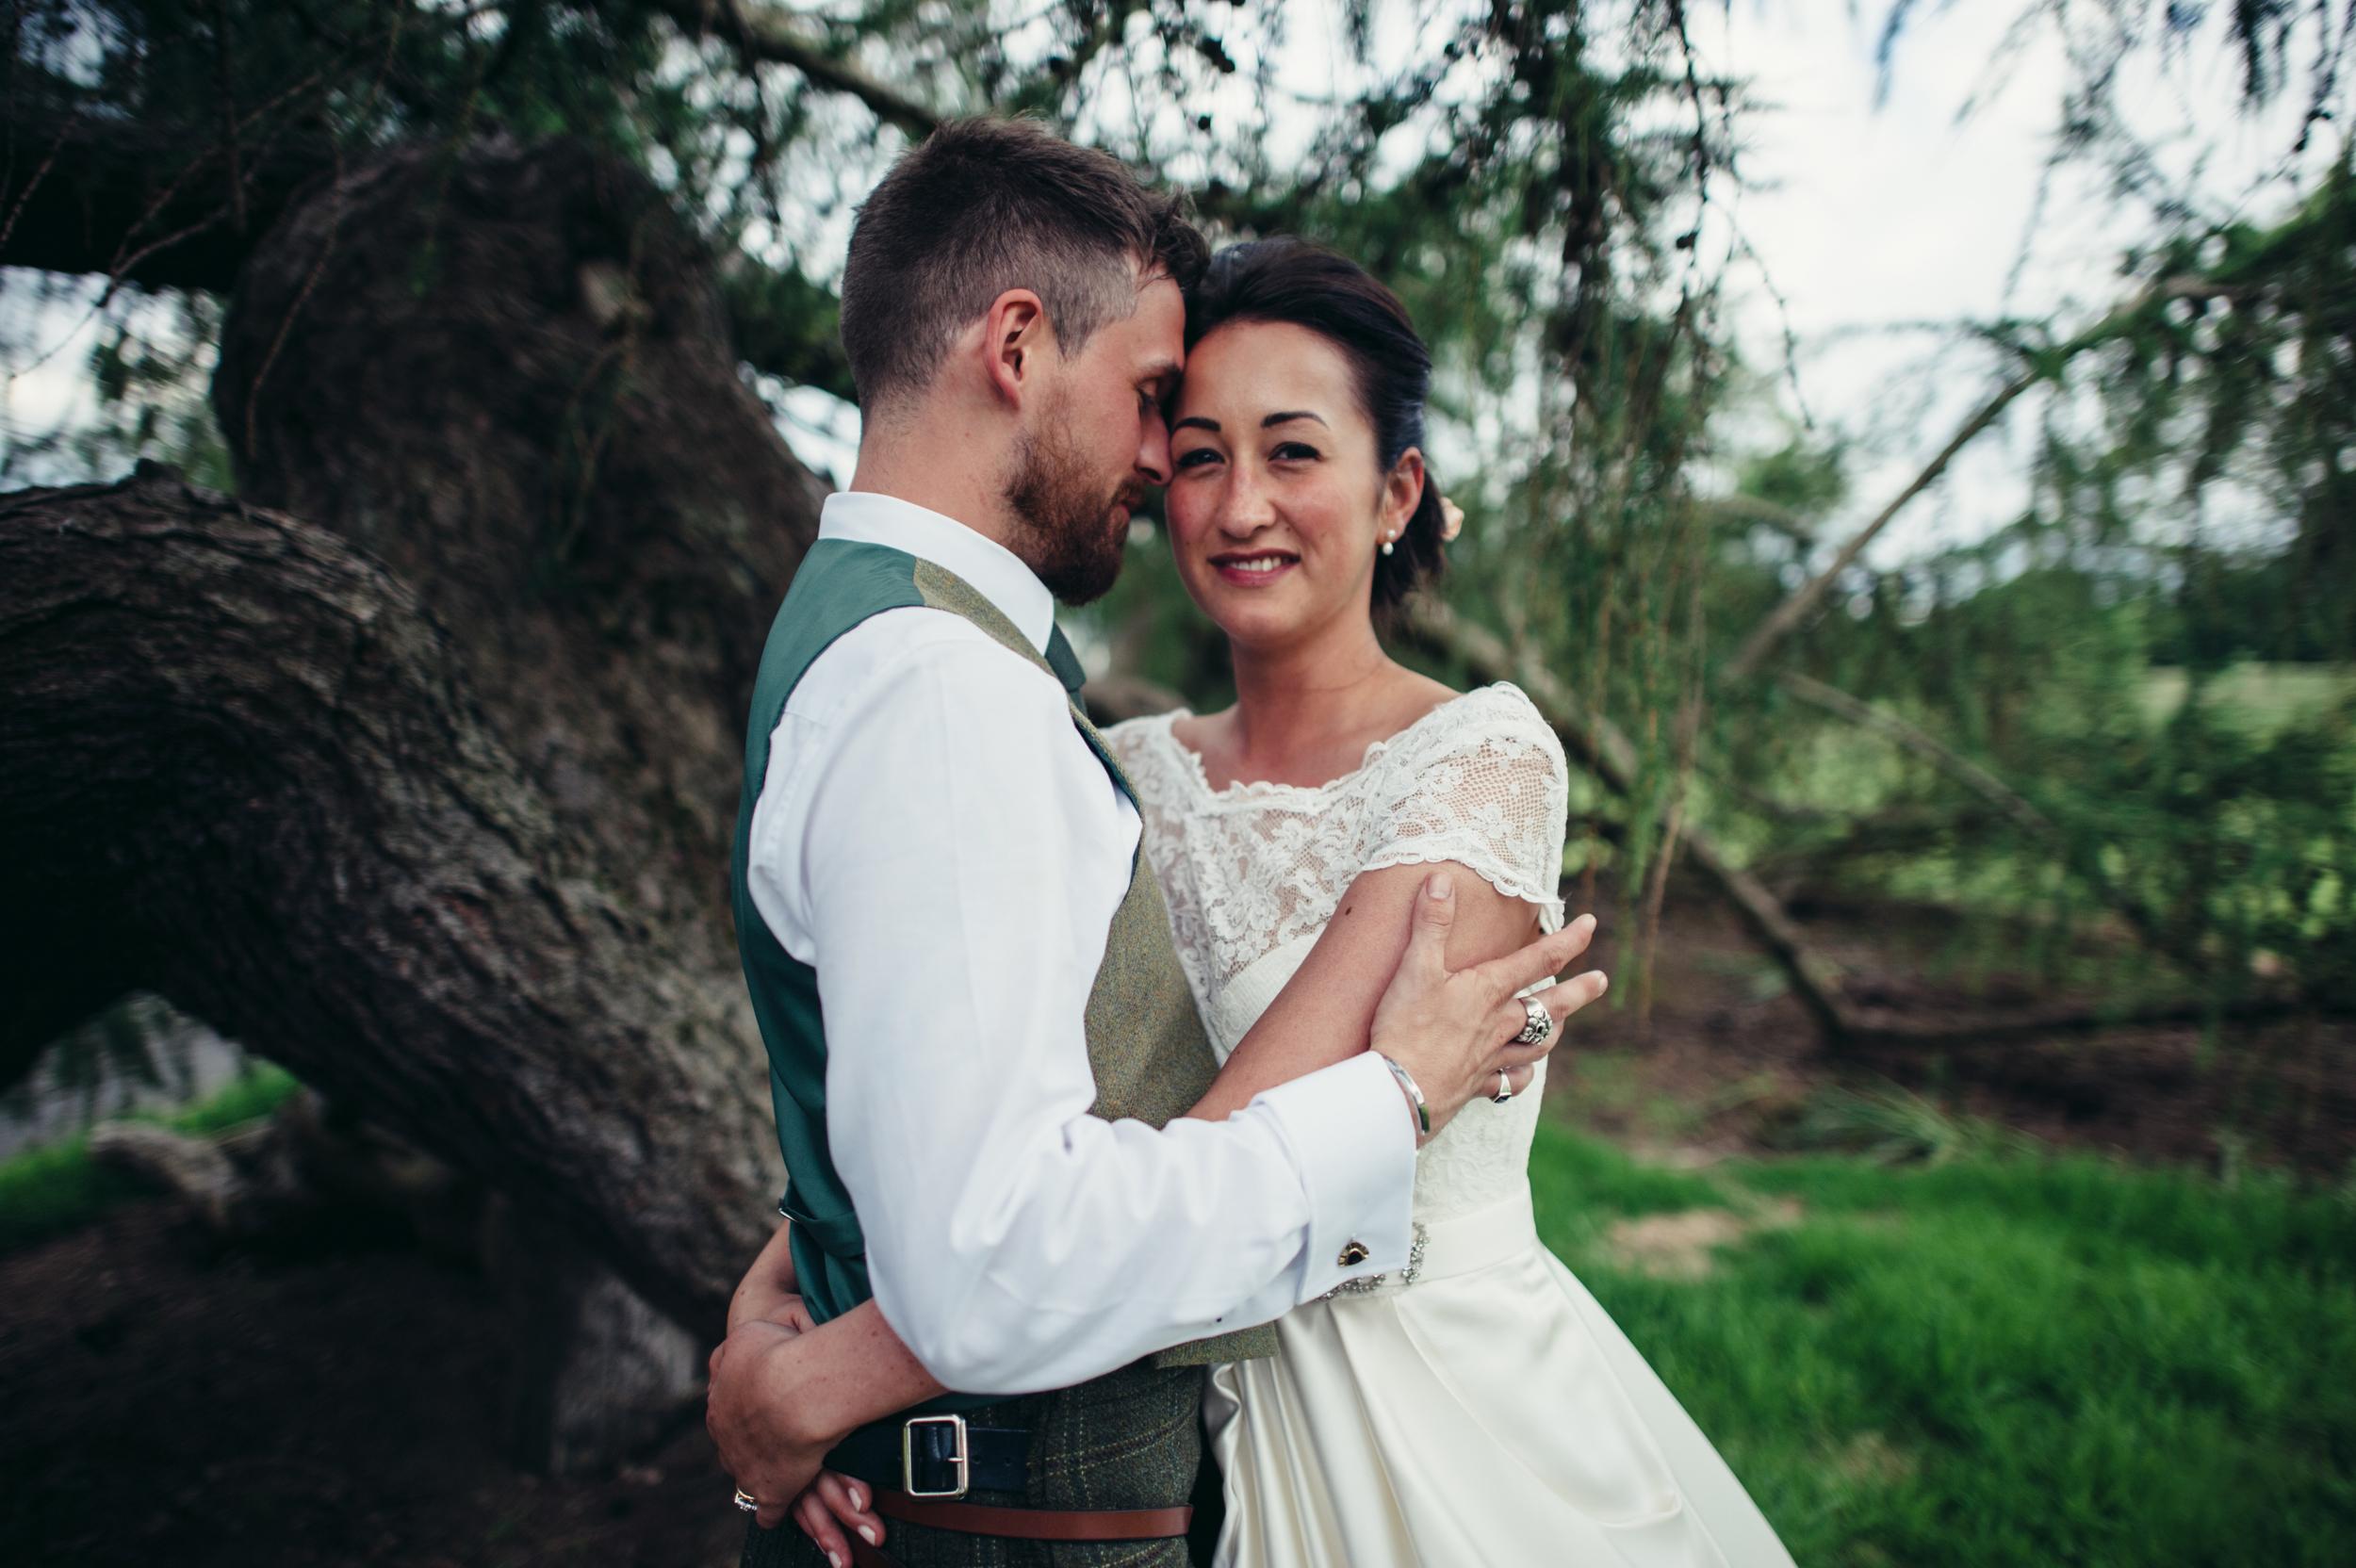 0174-lisa-devine-alternative-creative-wedding-photography-glasgow-edinburgh.JPG